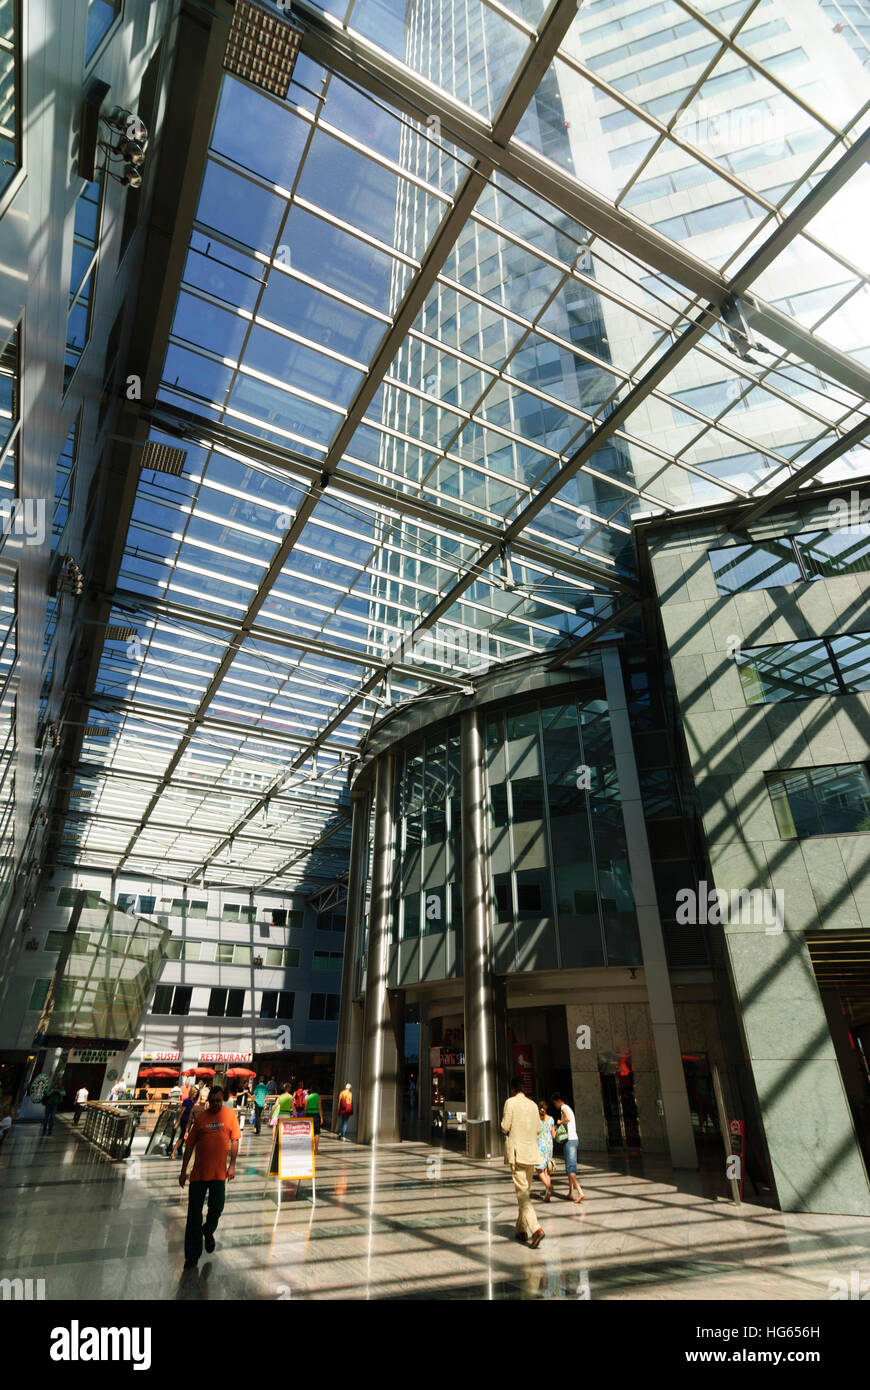 Wien, Wien: Büroturm Millennium Center, 01., Wien, Österreich Stockbild